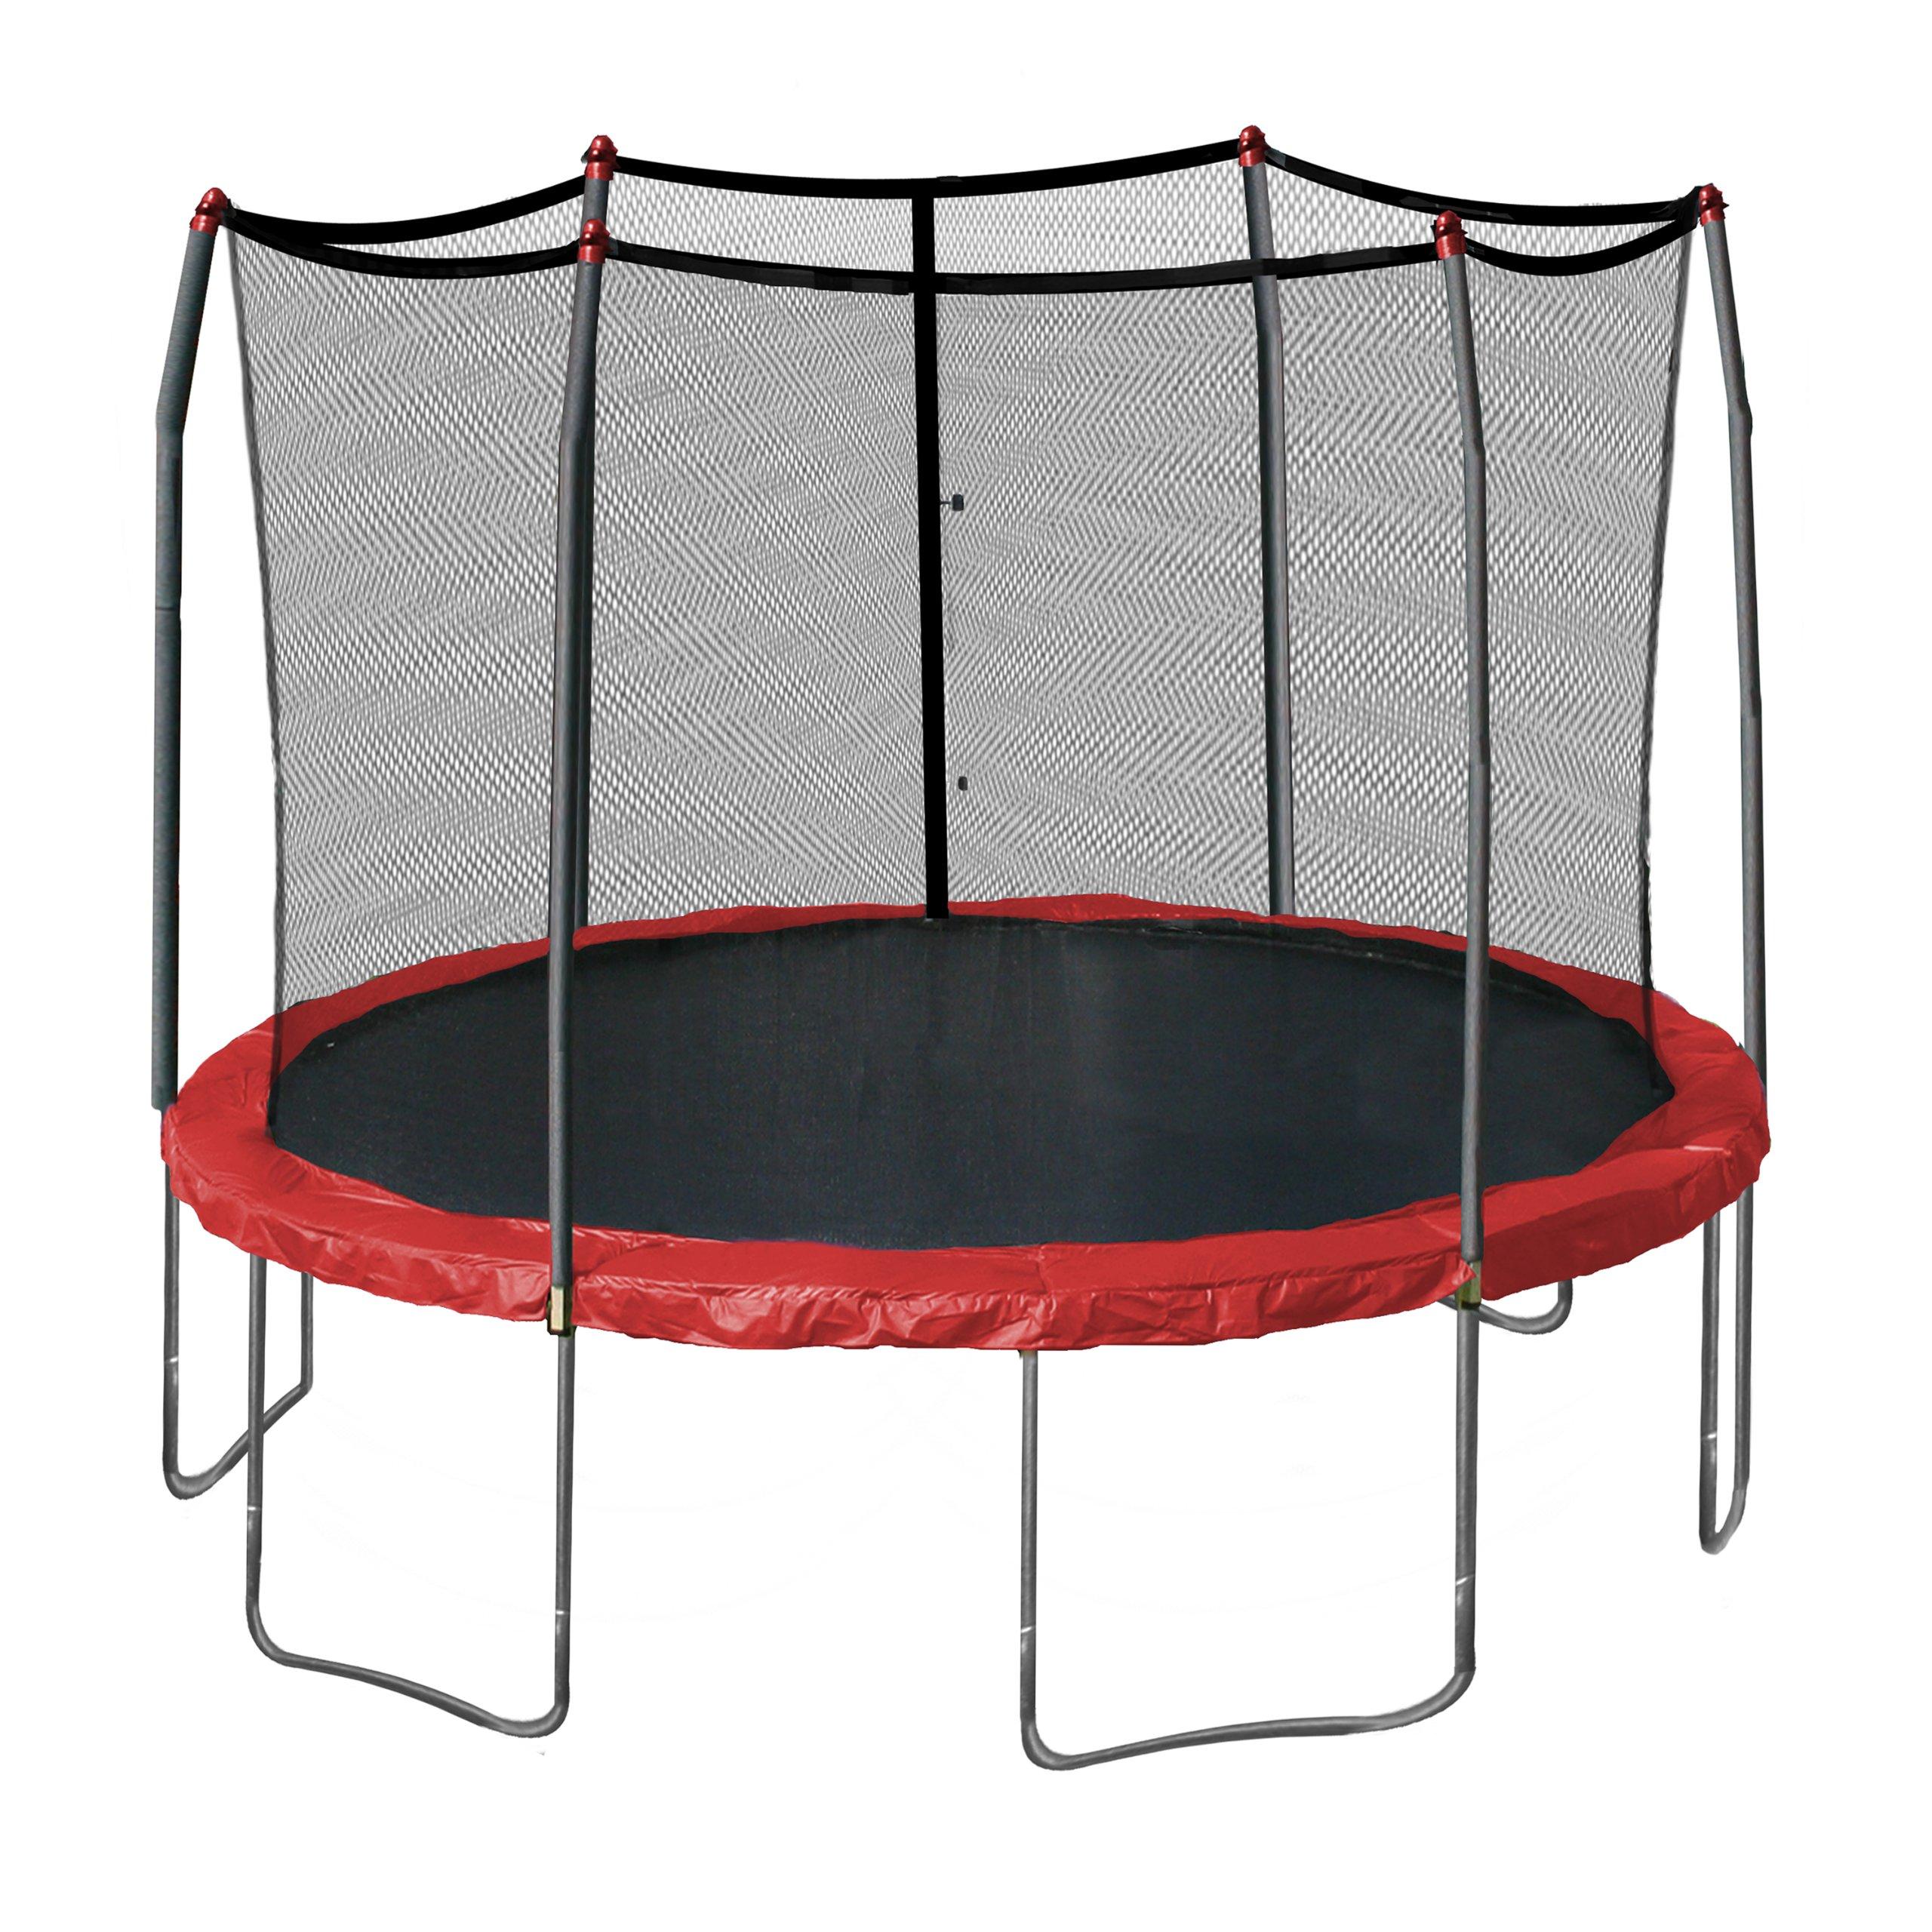 Skywalker 12-Feet Round Trampoline with Enclosure, Red by Skywalker Trampolines